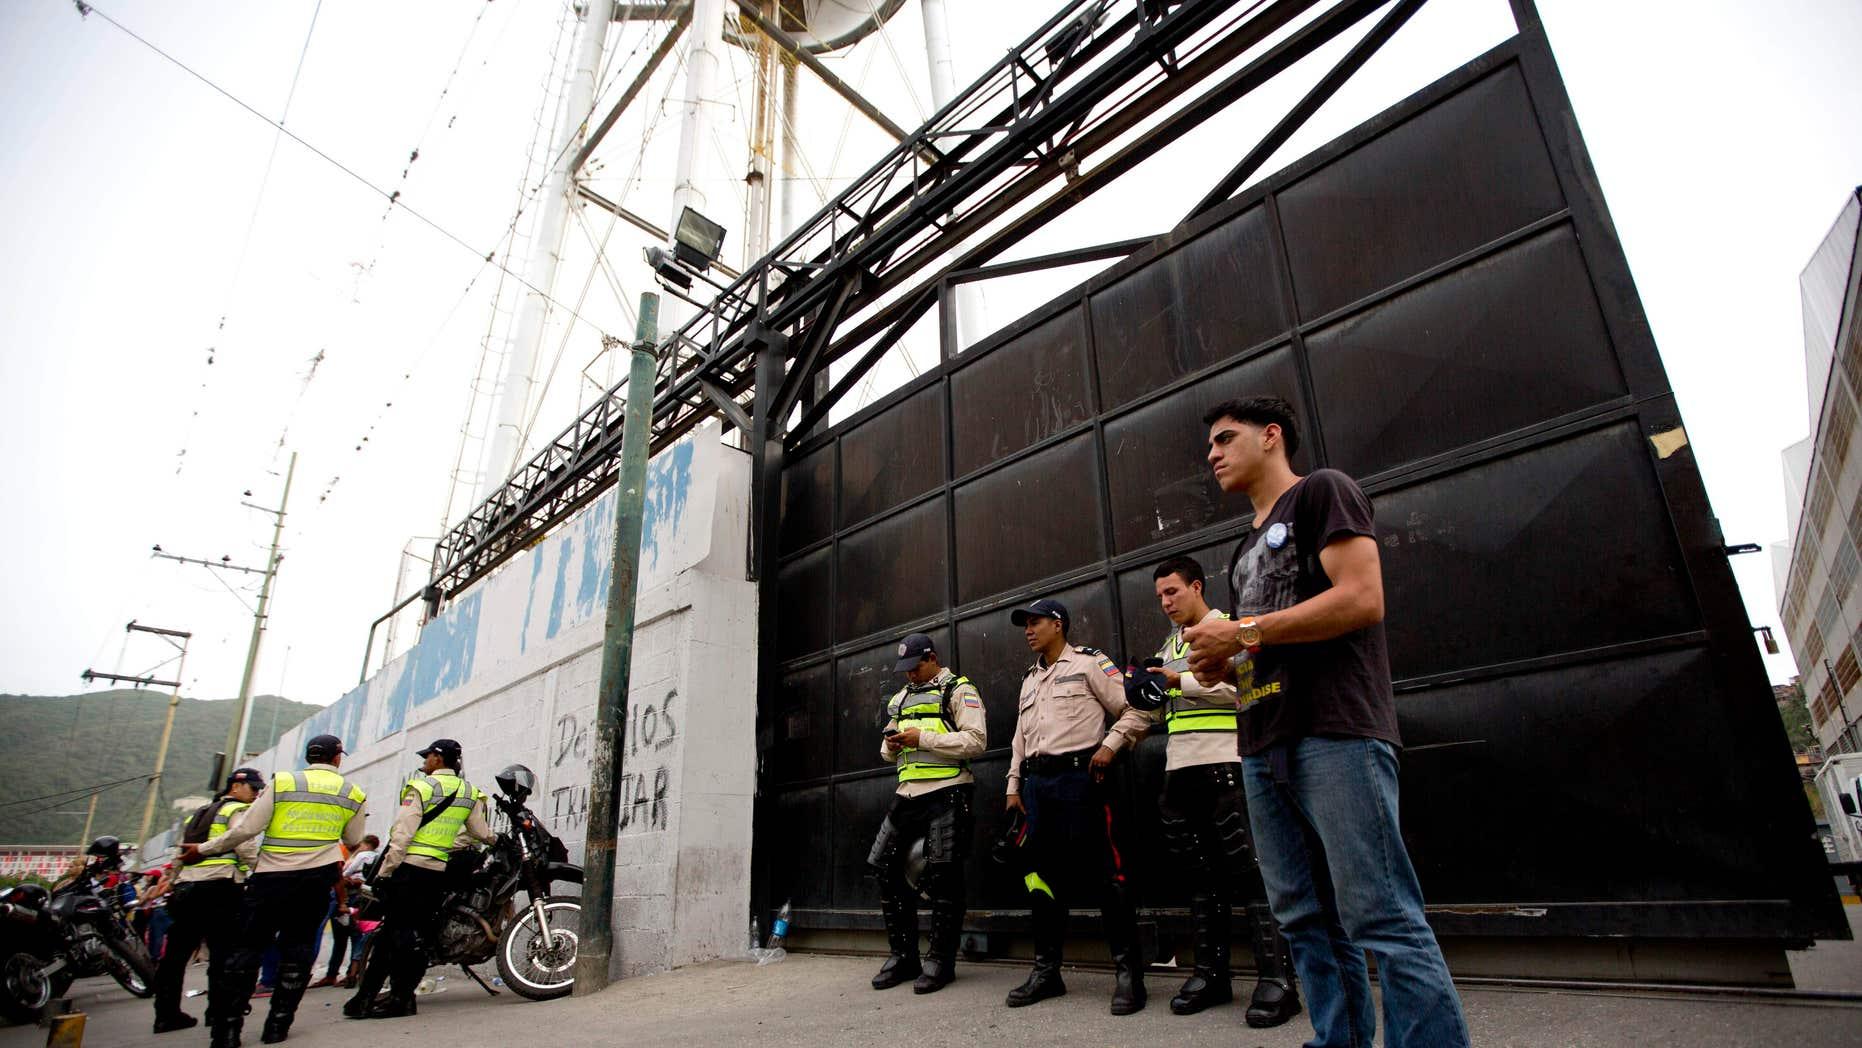 Bolivarian Police officers at the gate of distribution center  of Empresas Polar, in Caracas, Venezuela, Thursday, July 30, 2015.